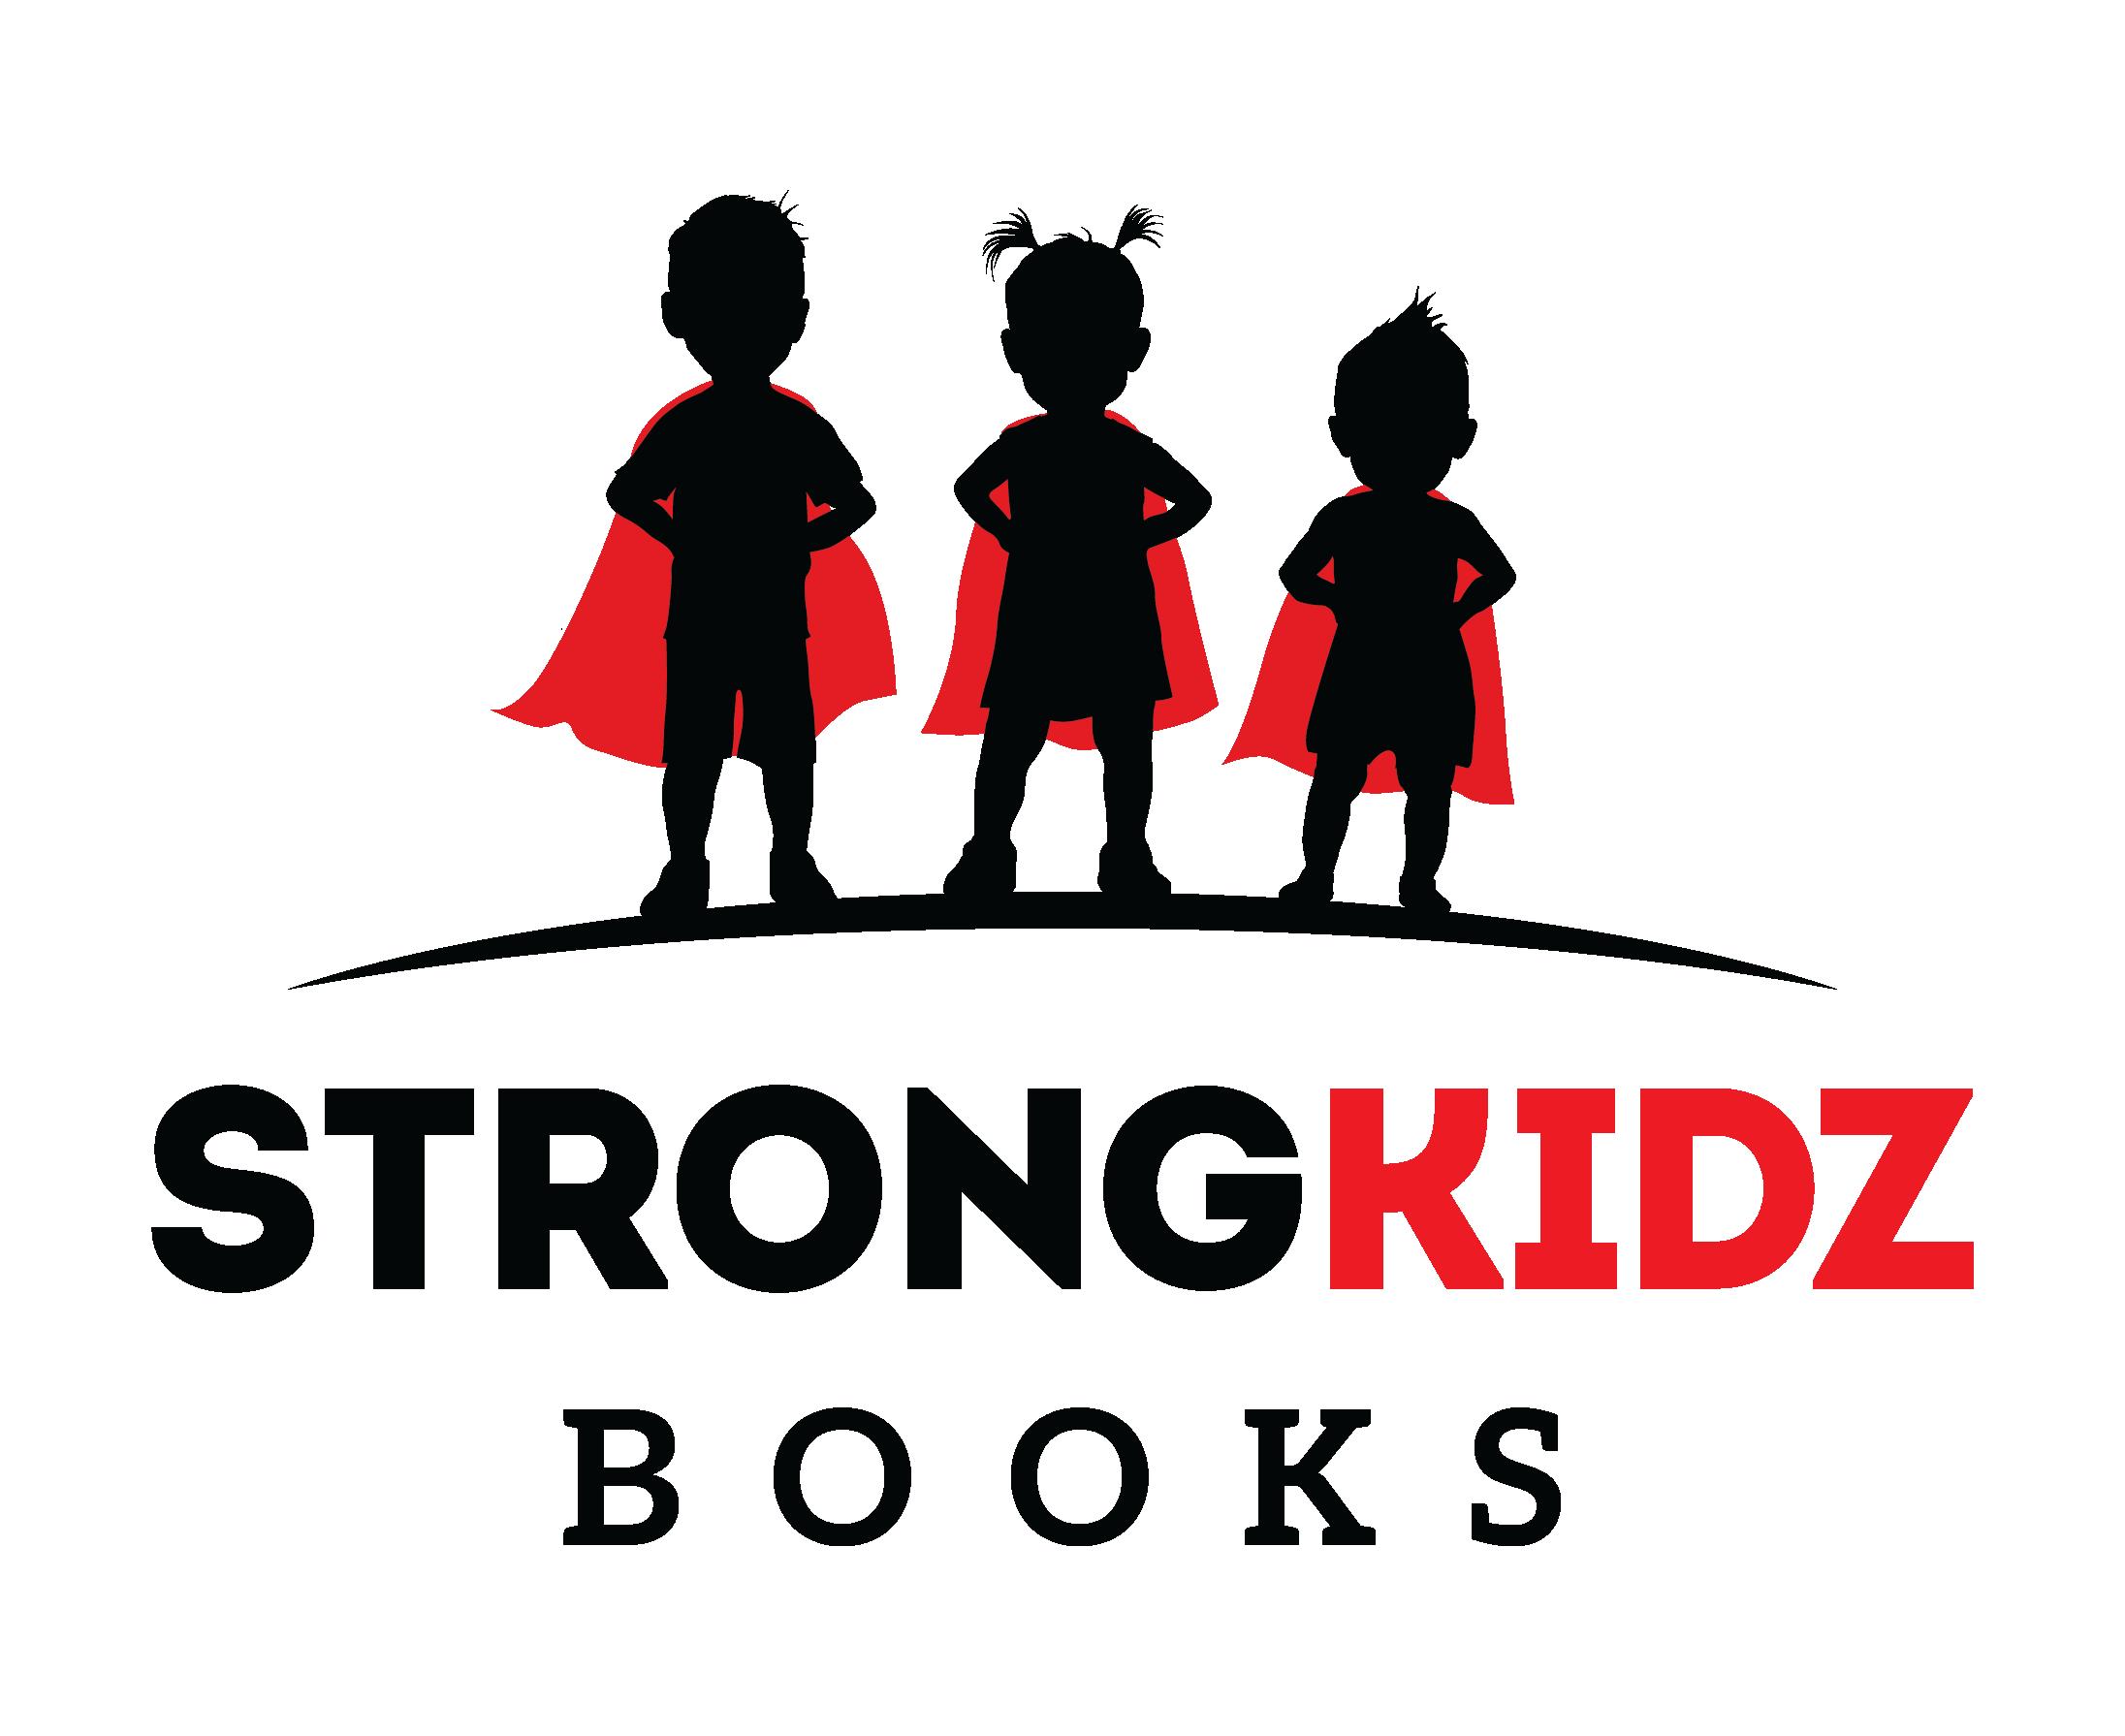 Strongkidzbooks_Primary.png